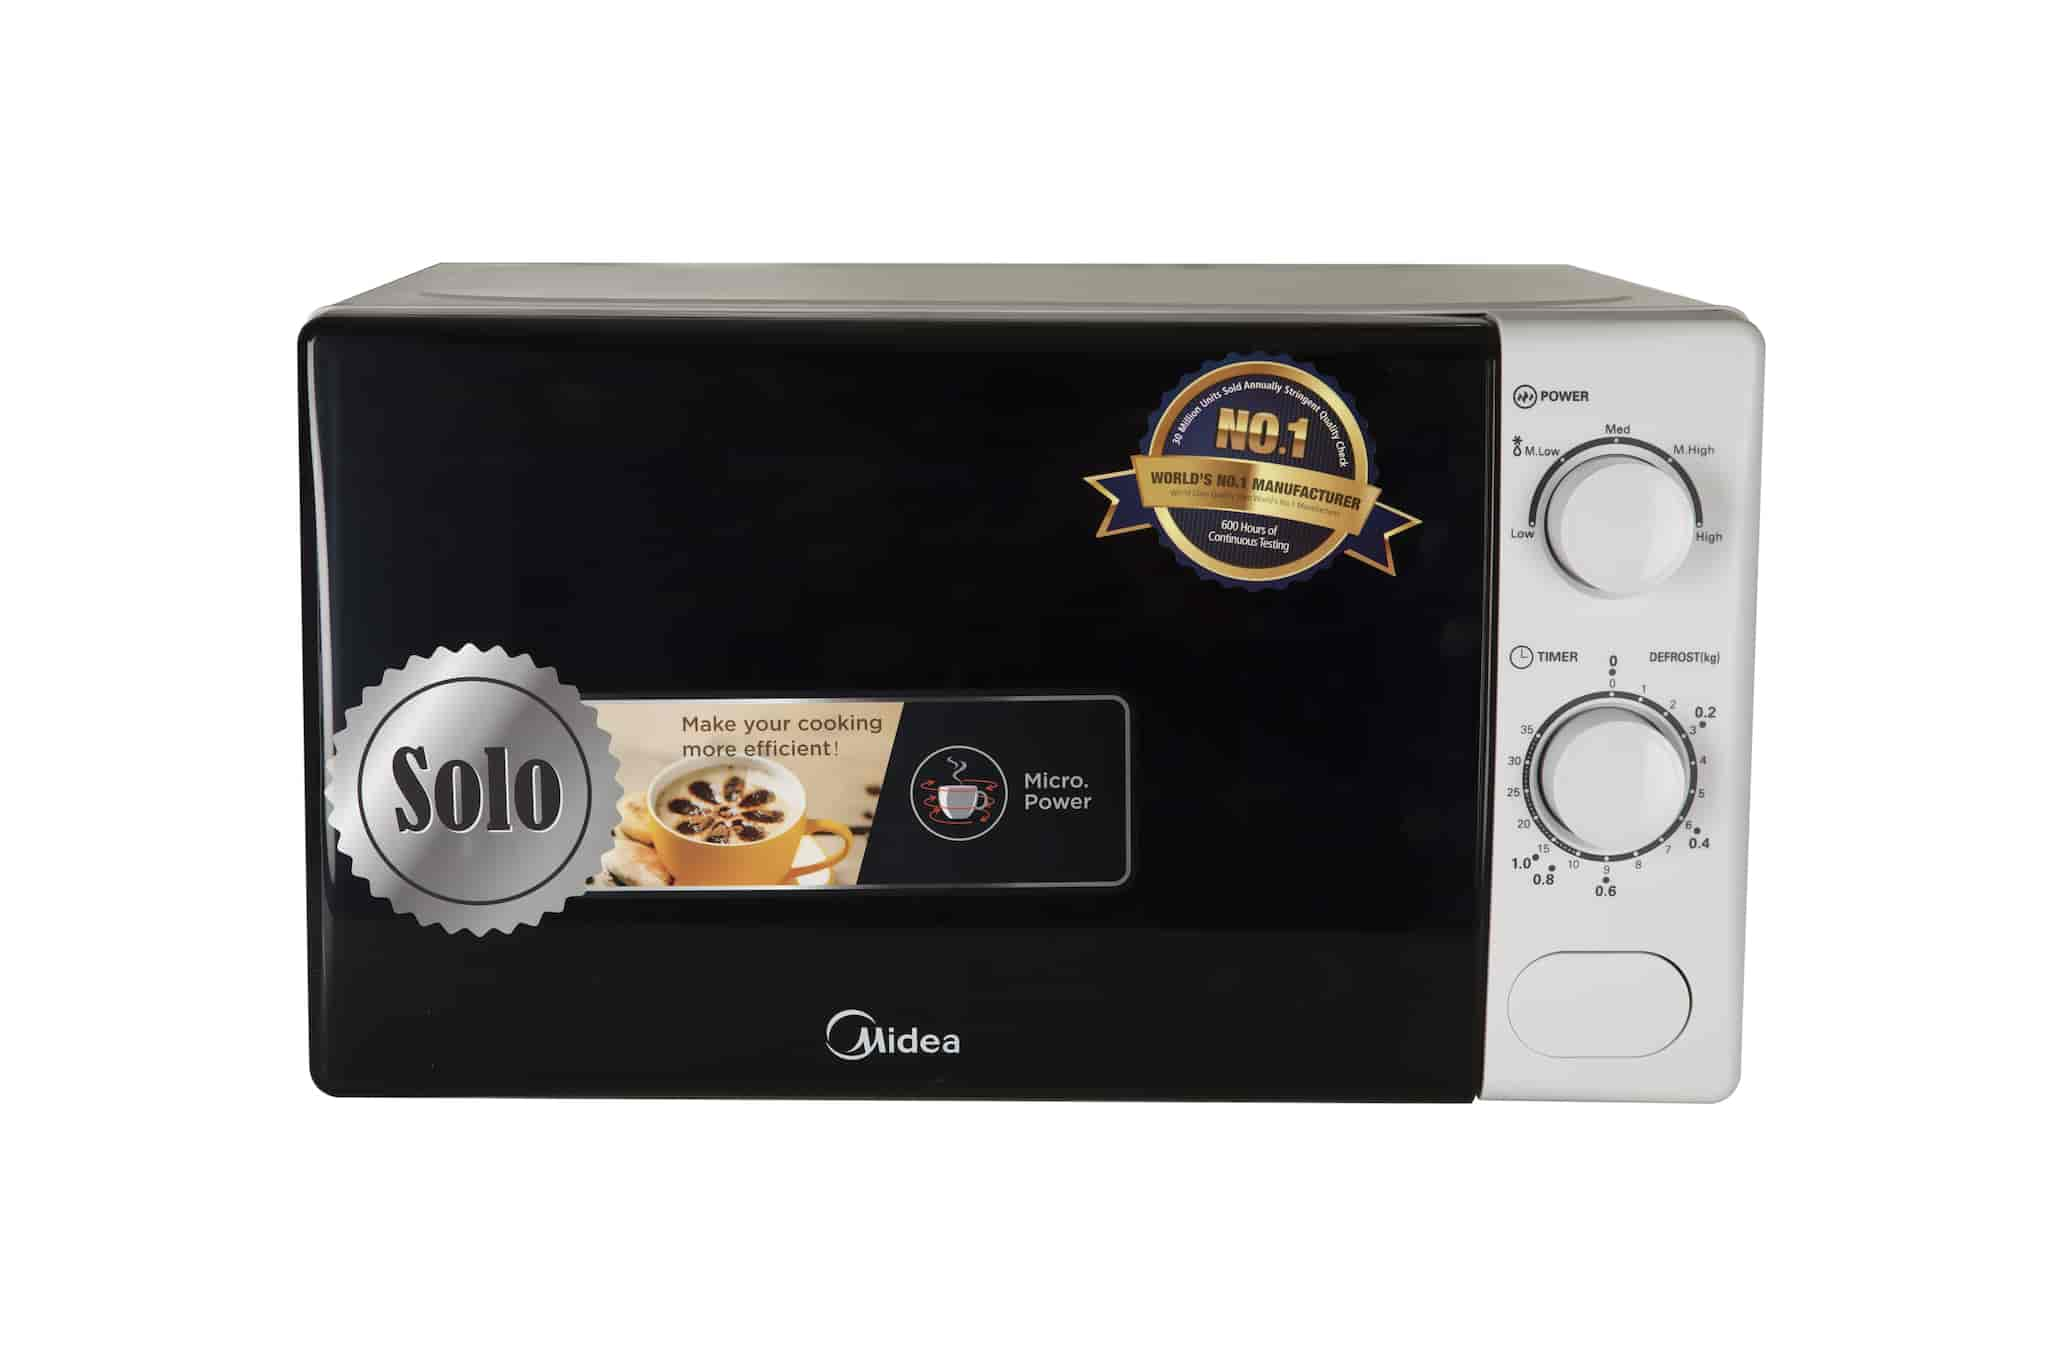 Midea Solo Microwave Oven Mm720cxm Pm